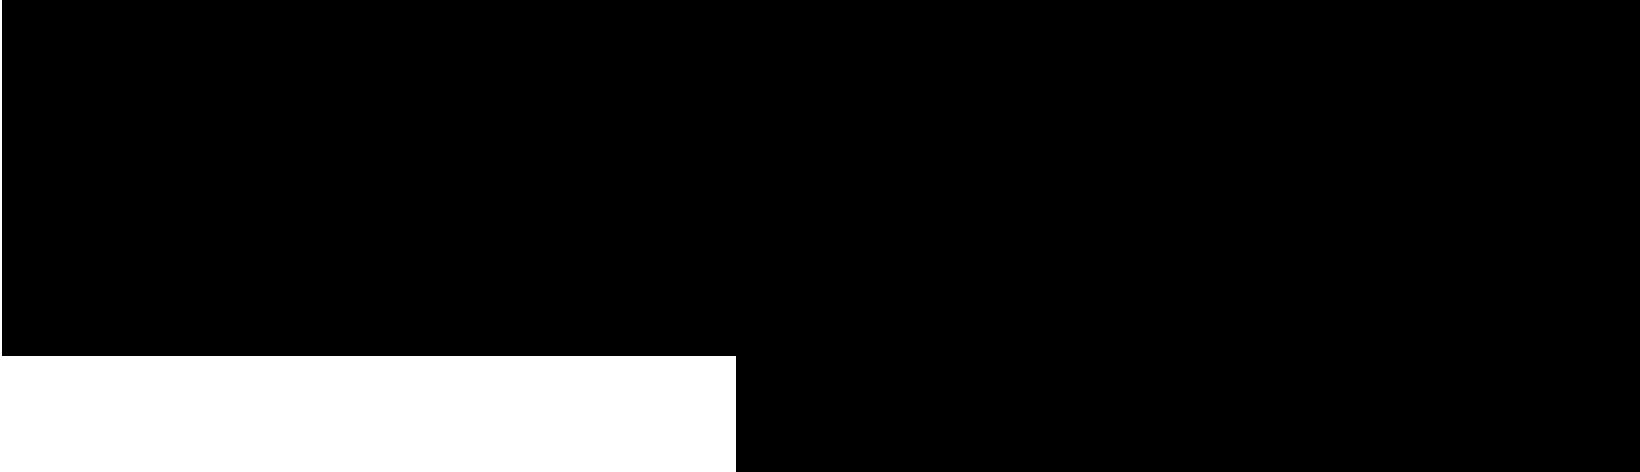 SUPER Xロゴ